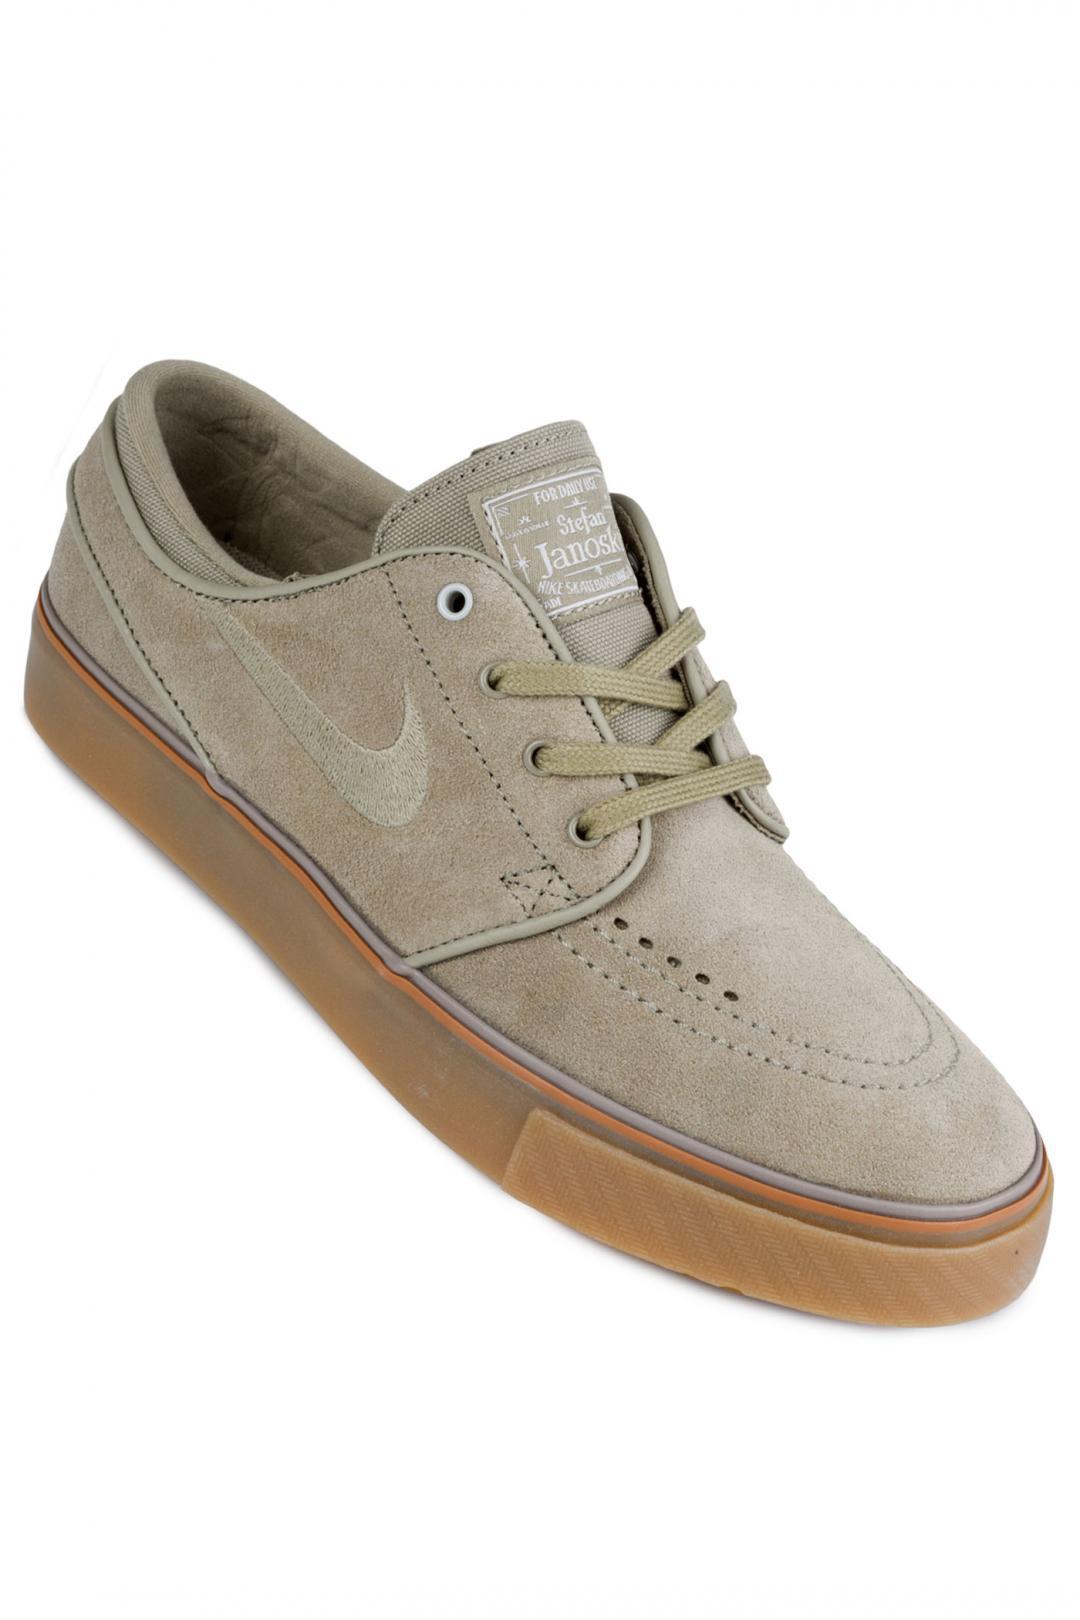 Donna Nike SB Zoom Stefan Janoski neutral olive | Sneakers low top